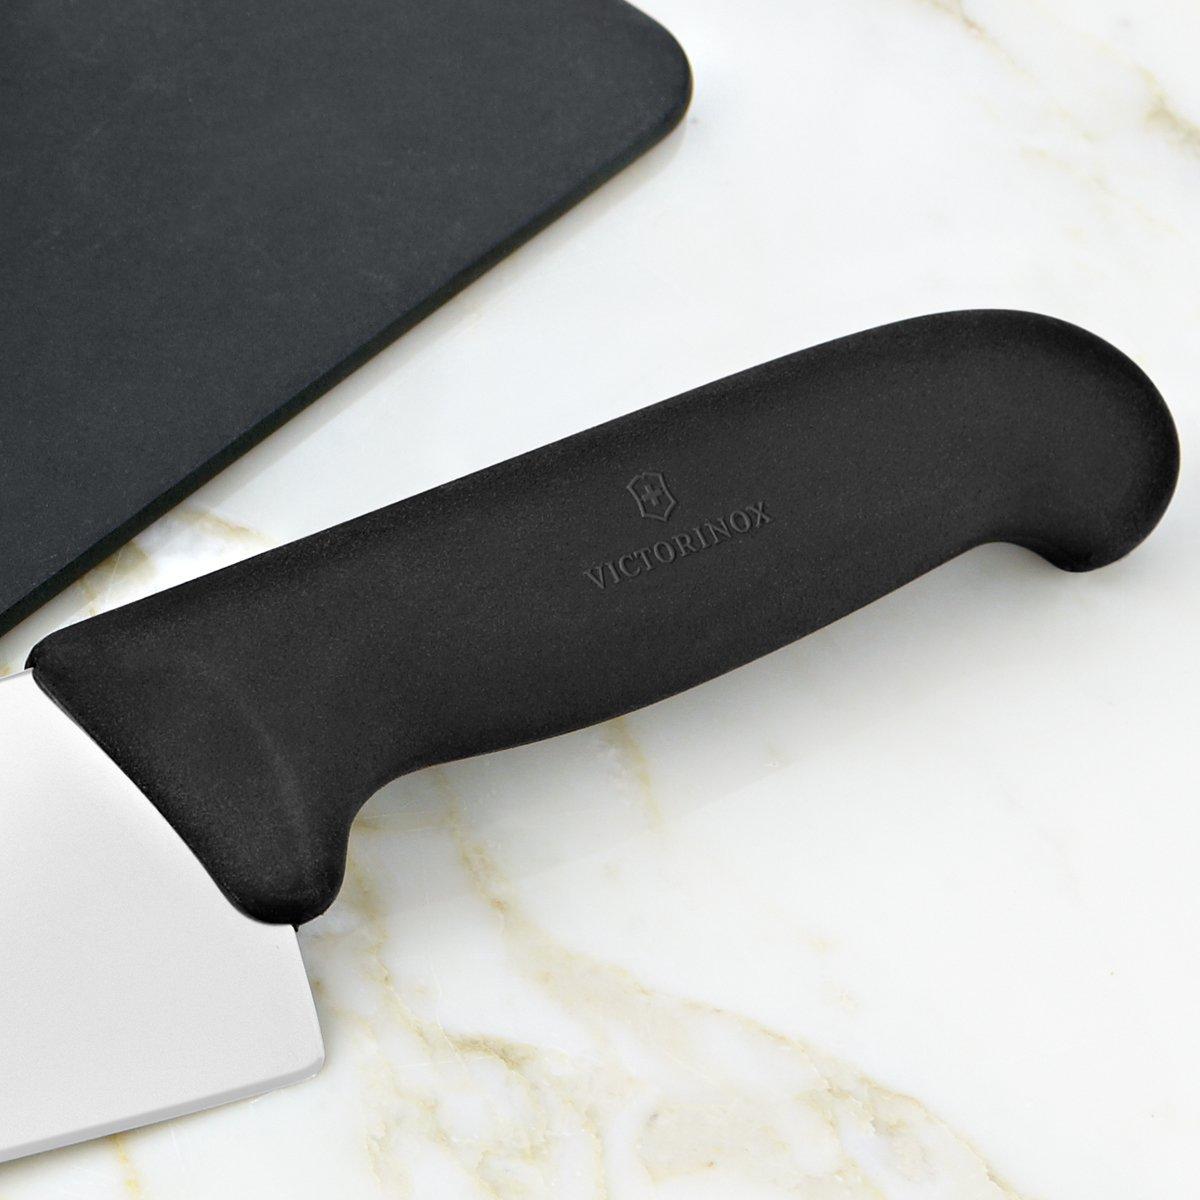 Victorinox Fibrox Pro Chef's Knife, 8-Inch Chef's FFP by Victorinox (Image #4)